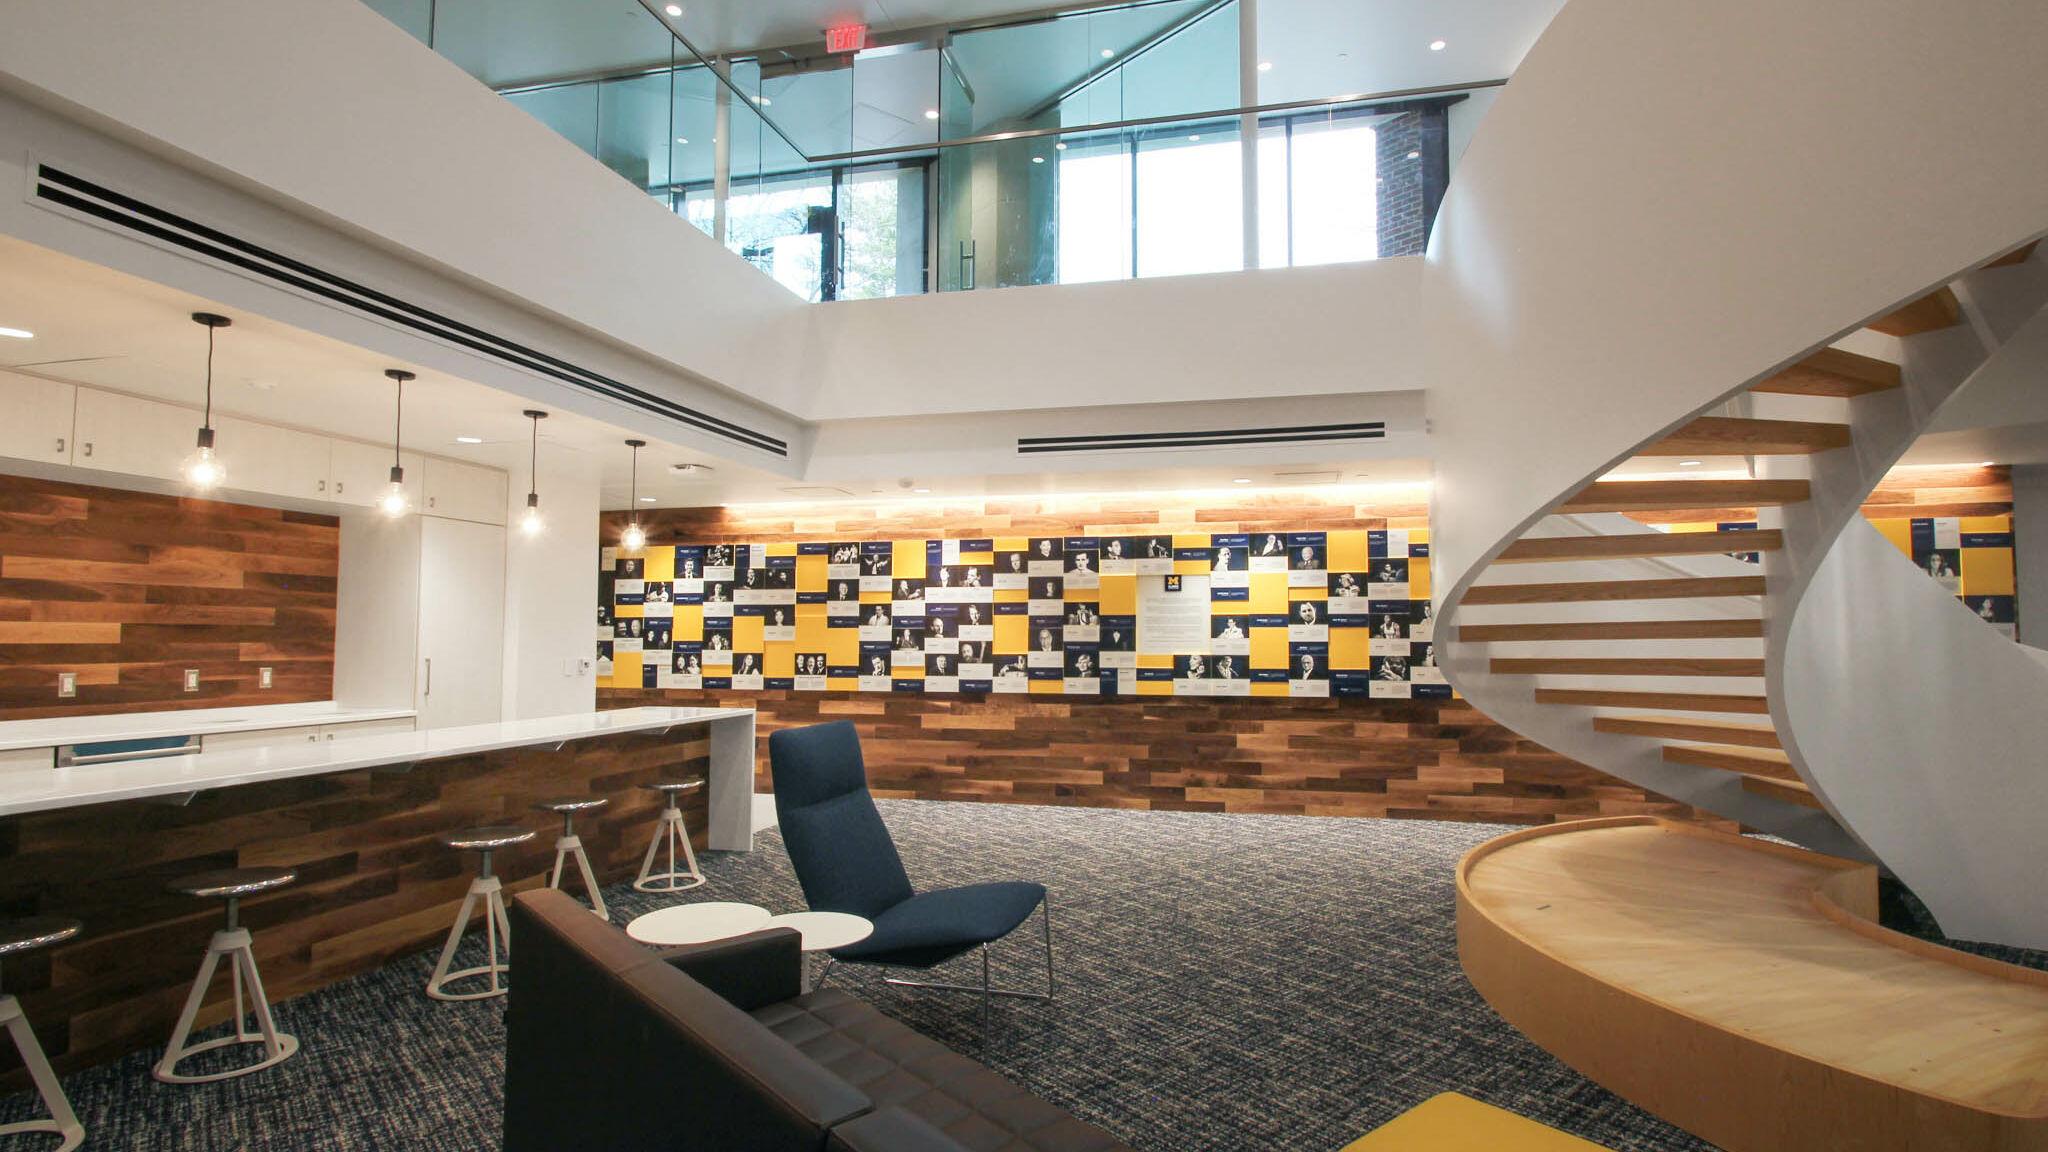 University of Michigan Alumni Center recognition display honors notable alumni